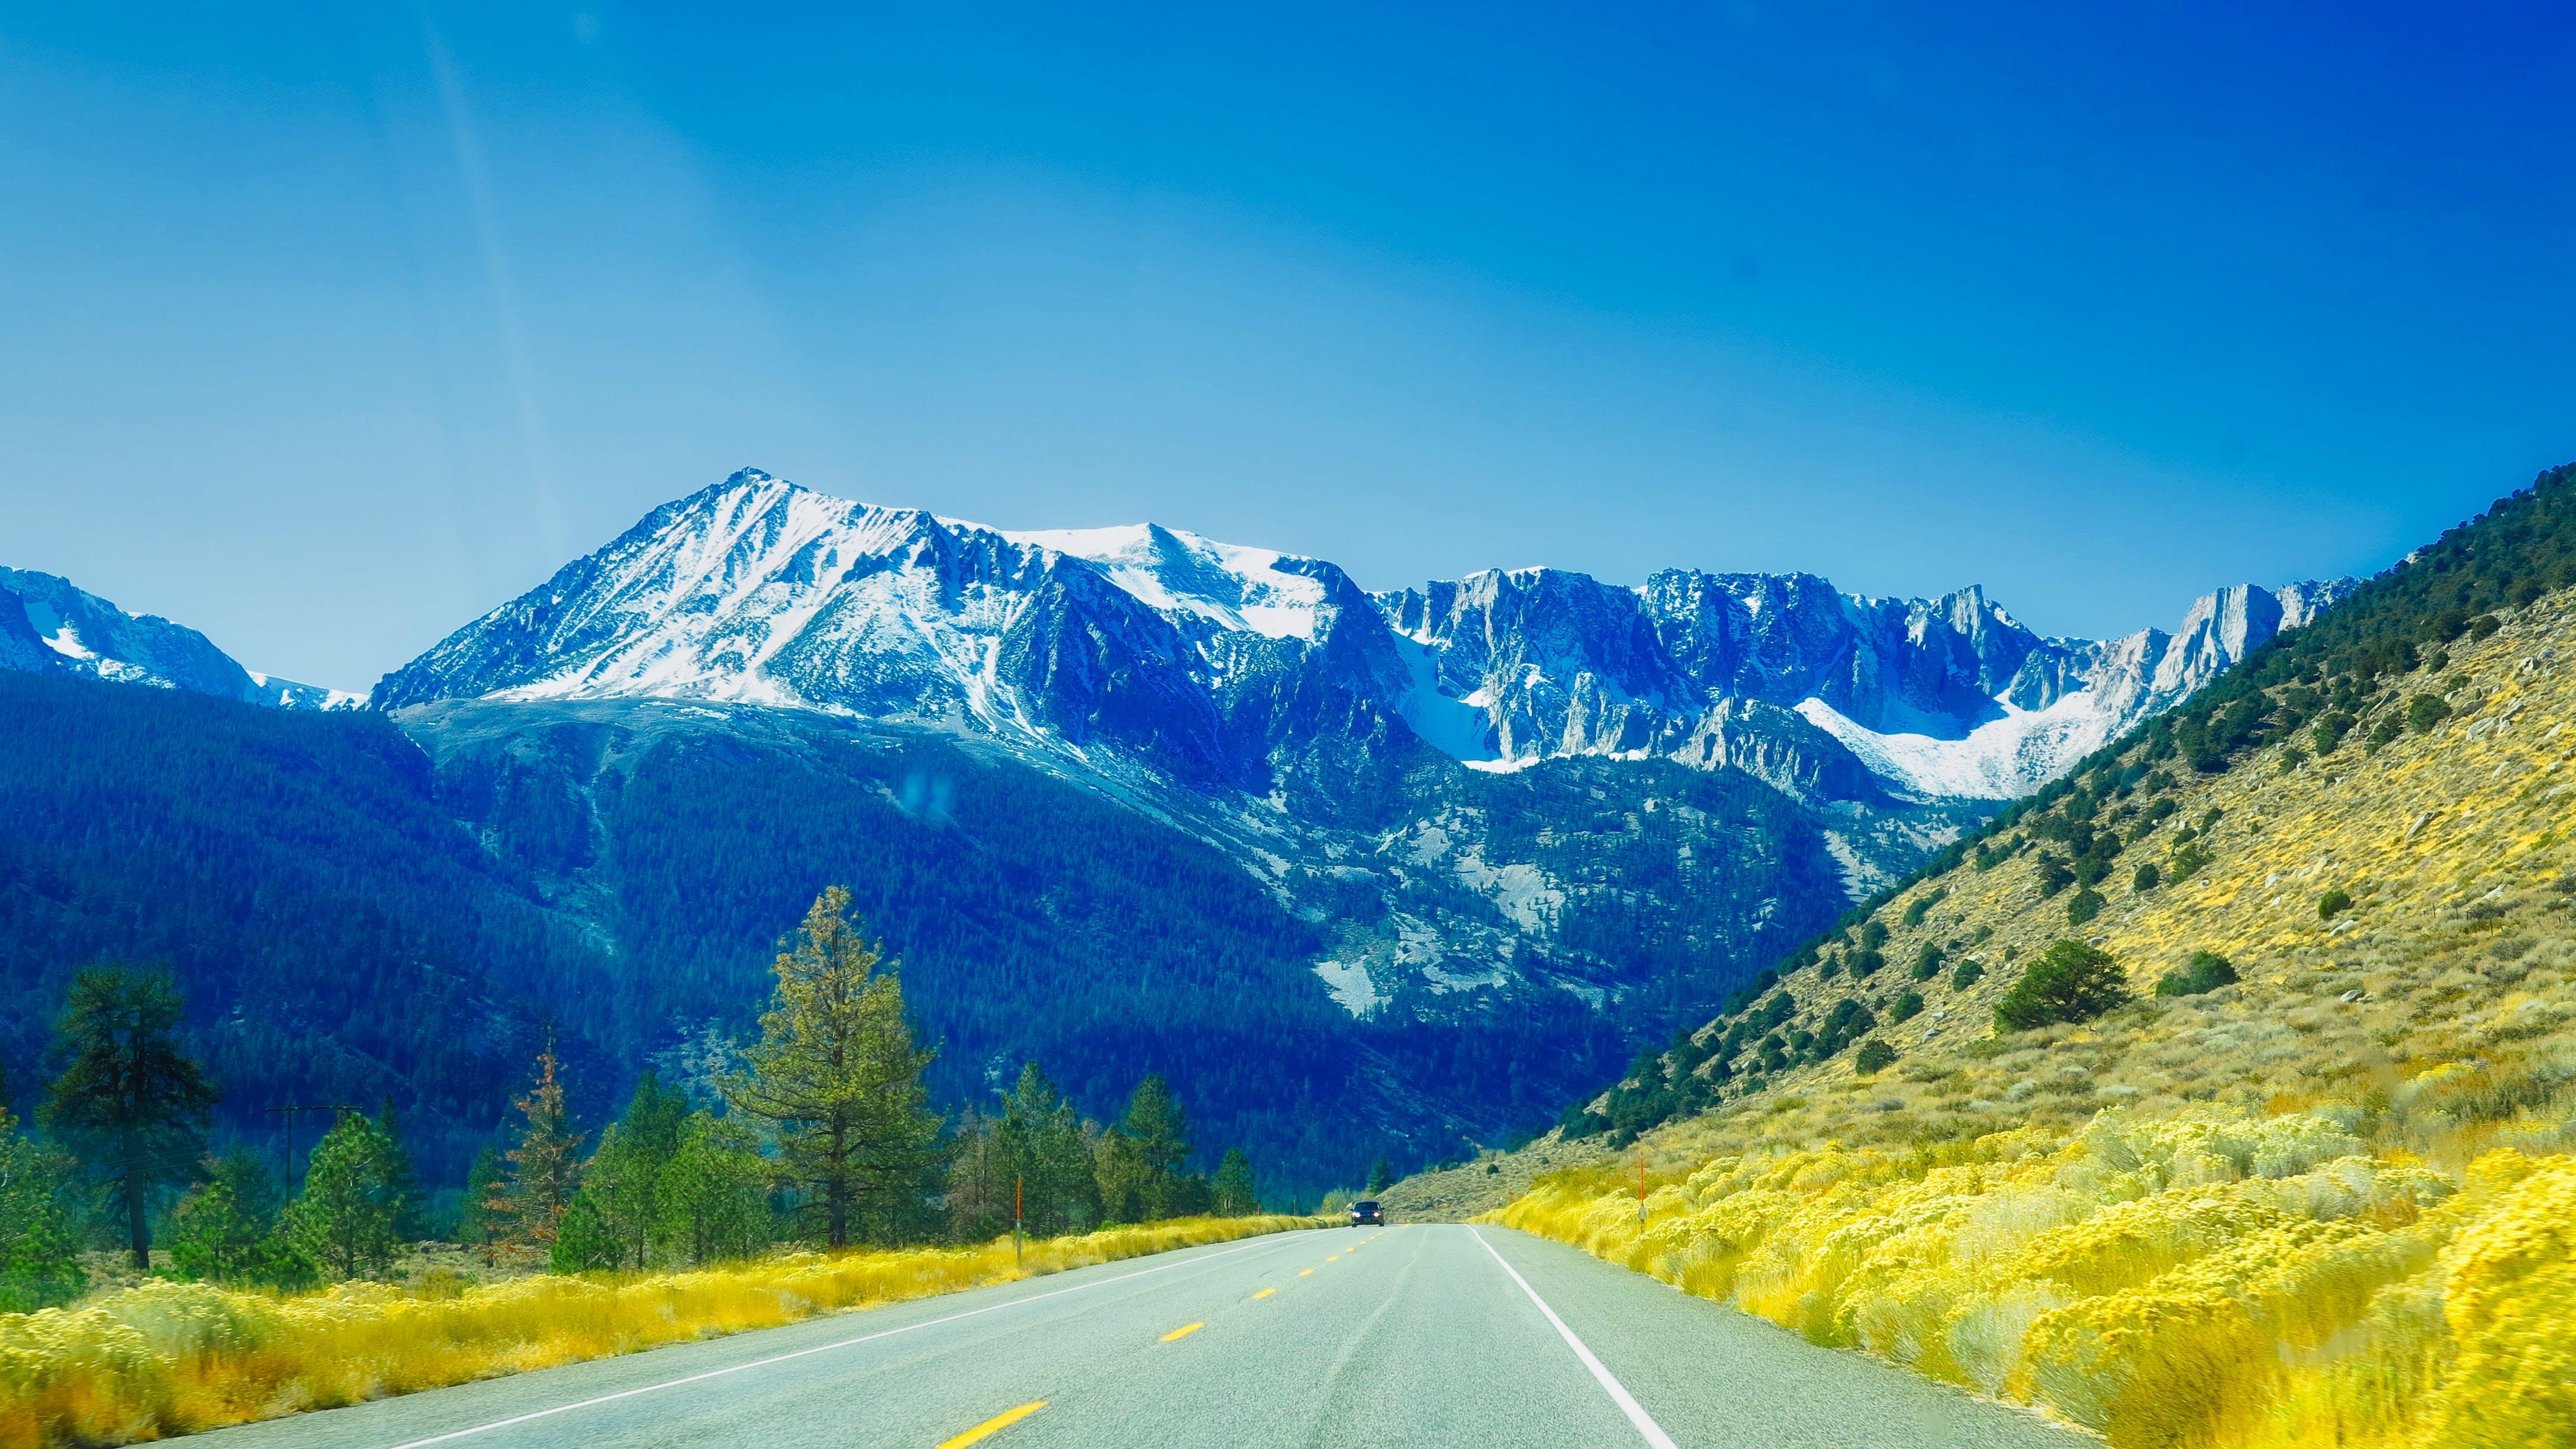 Grey Concrete Road Towards Mountain